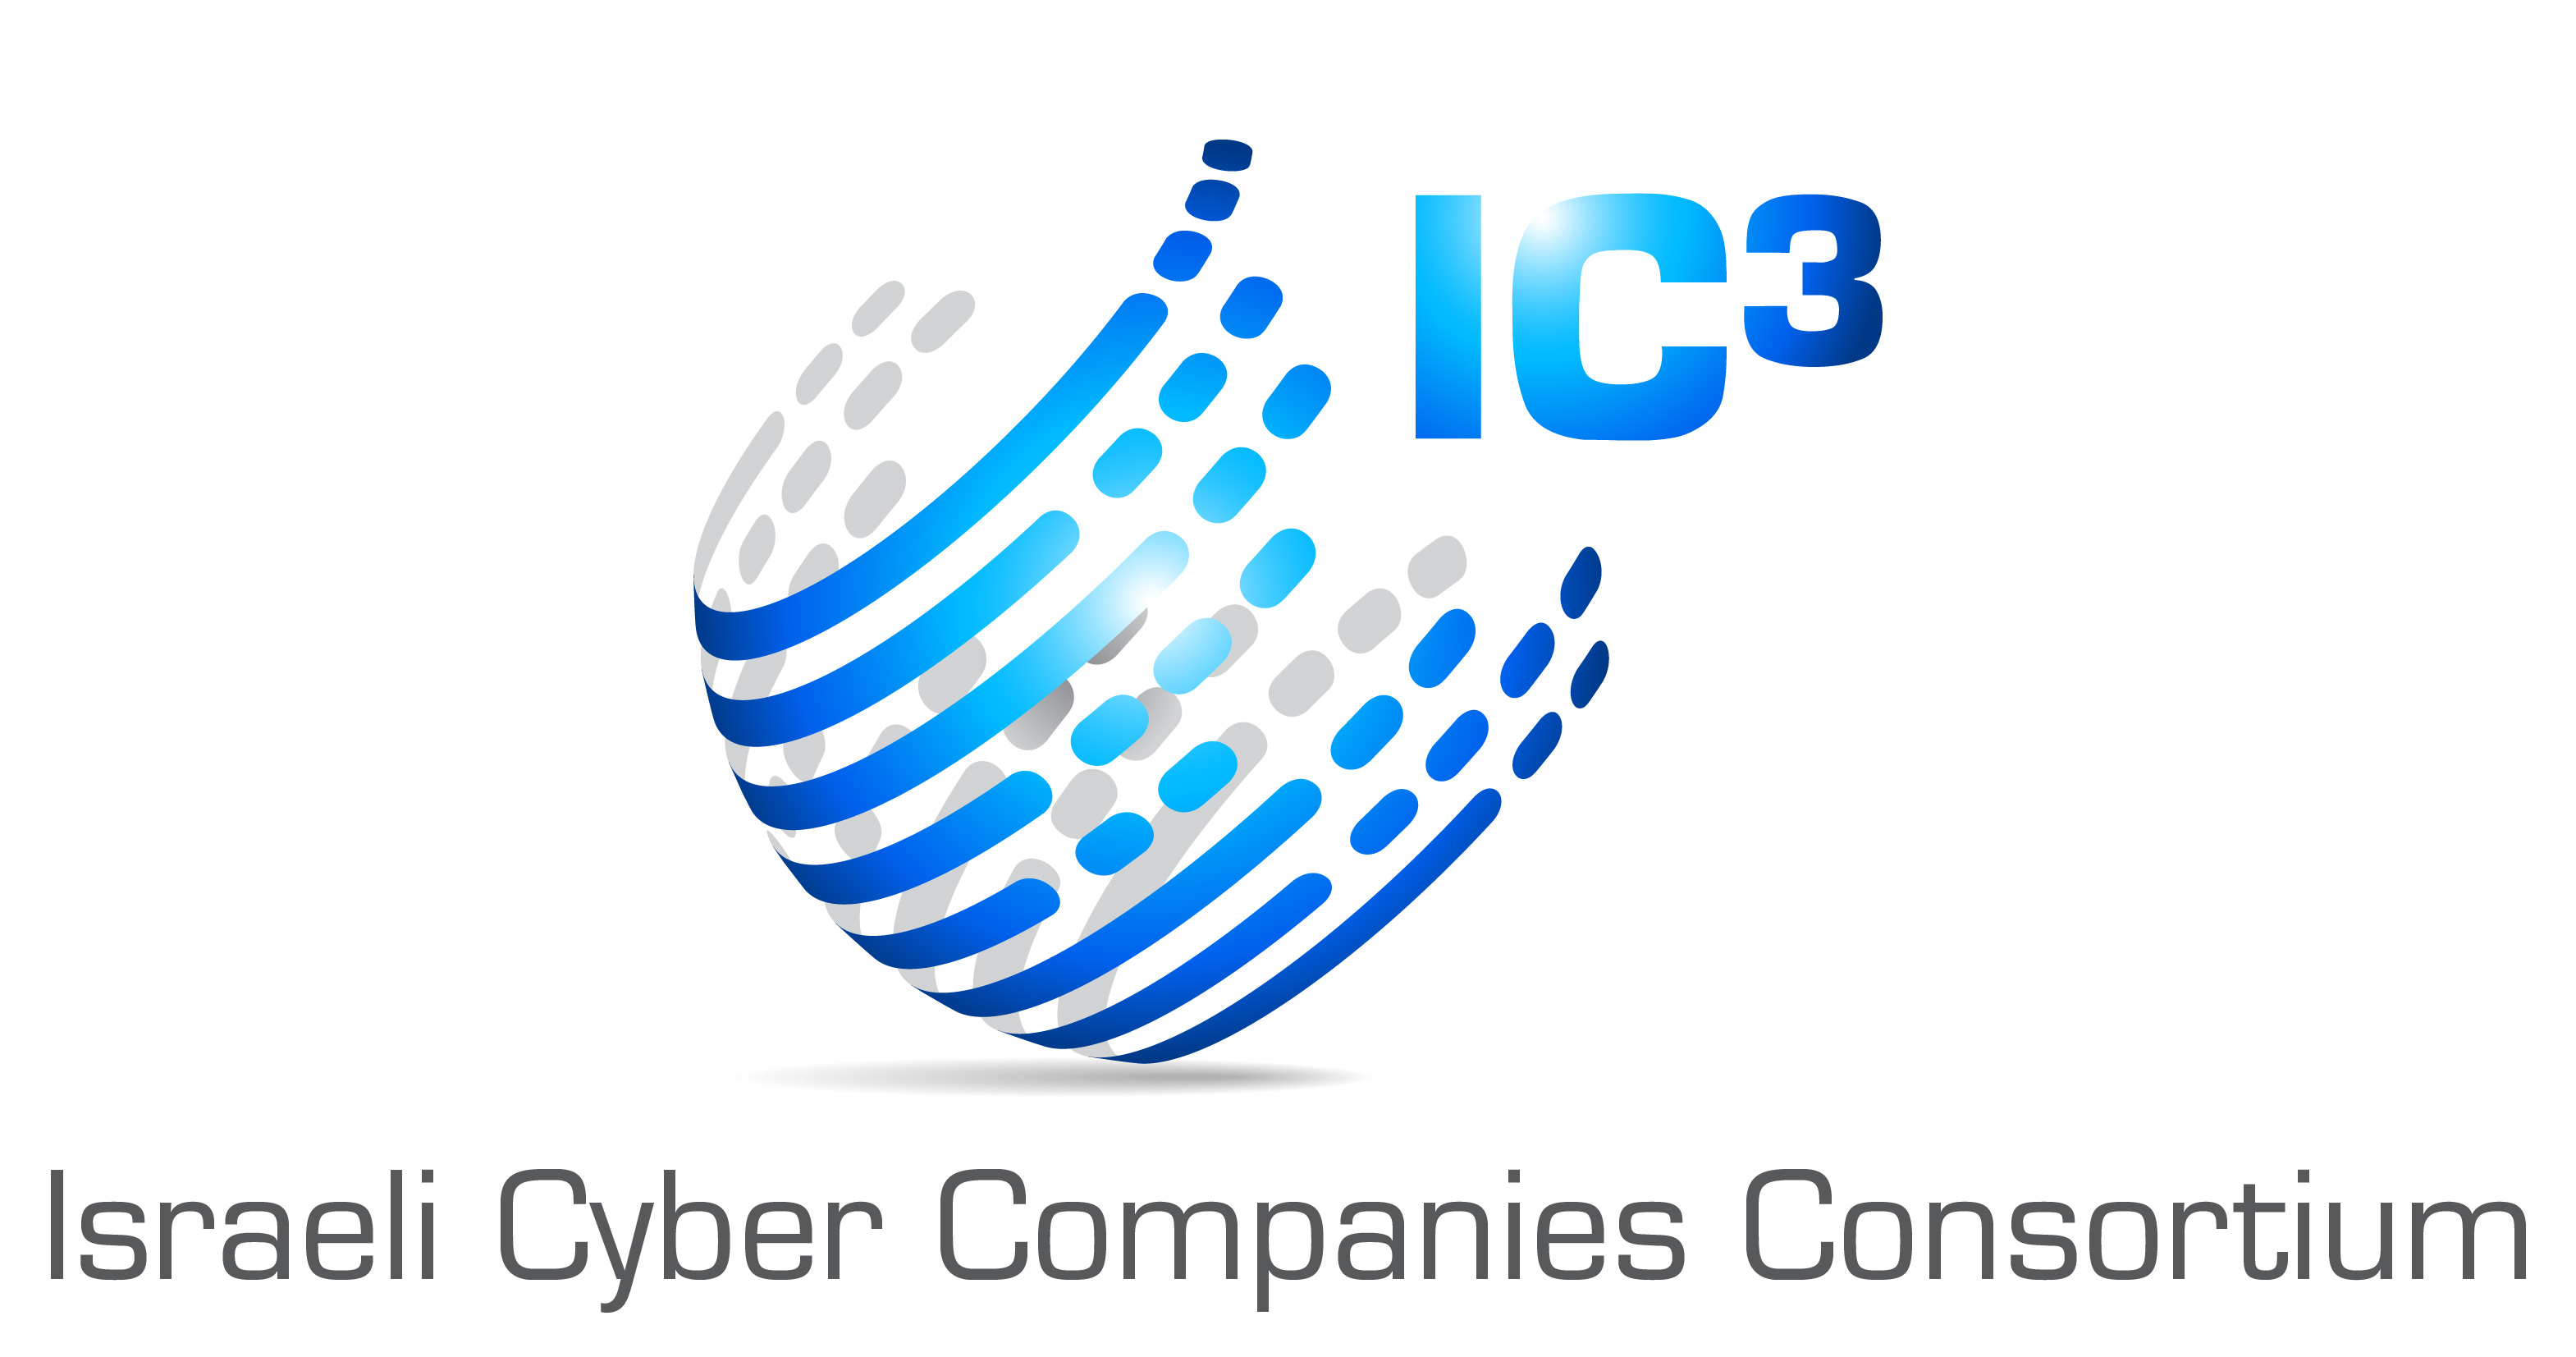 LAAD 2017: O Consórcio Israelense de Empresas Cibernéticas (IC3), liderado pela IAI, estabelecerá centro cibernético nacional em país da América Latina